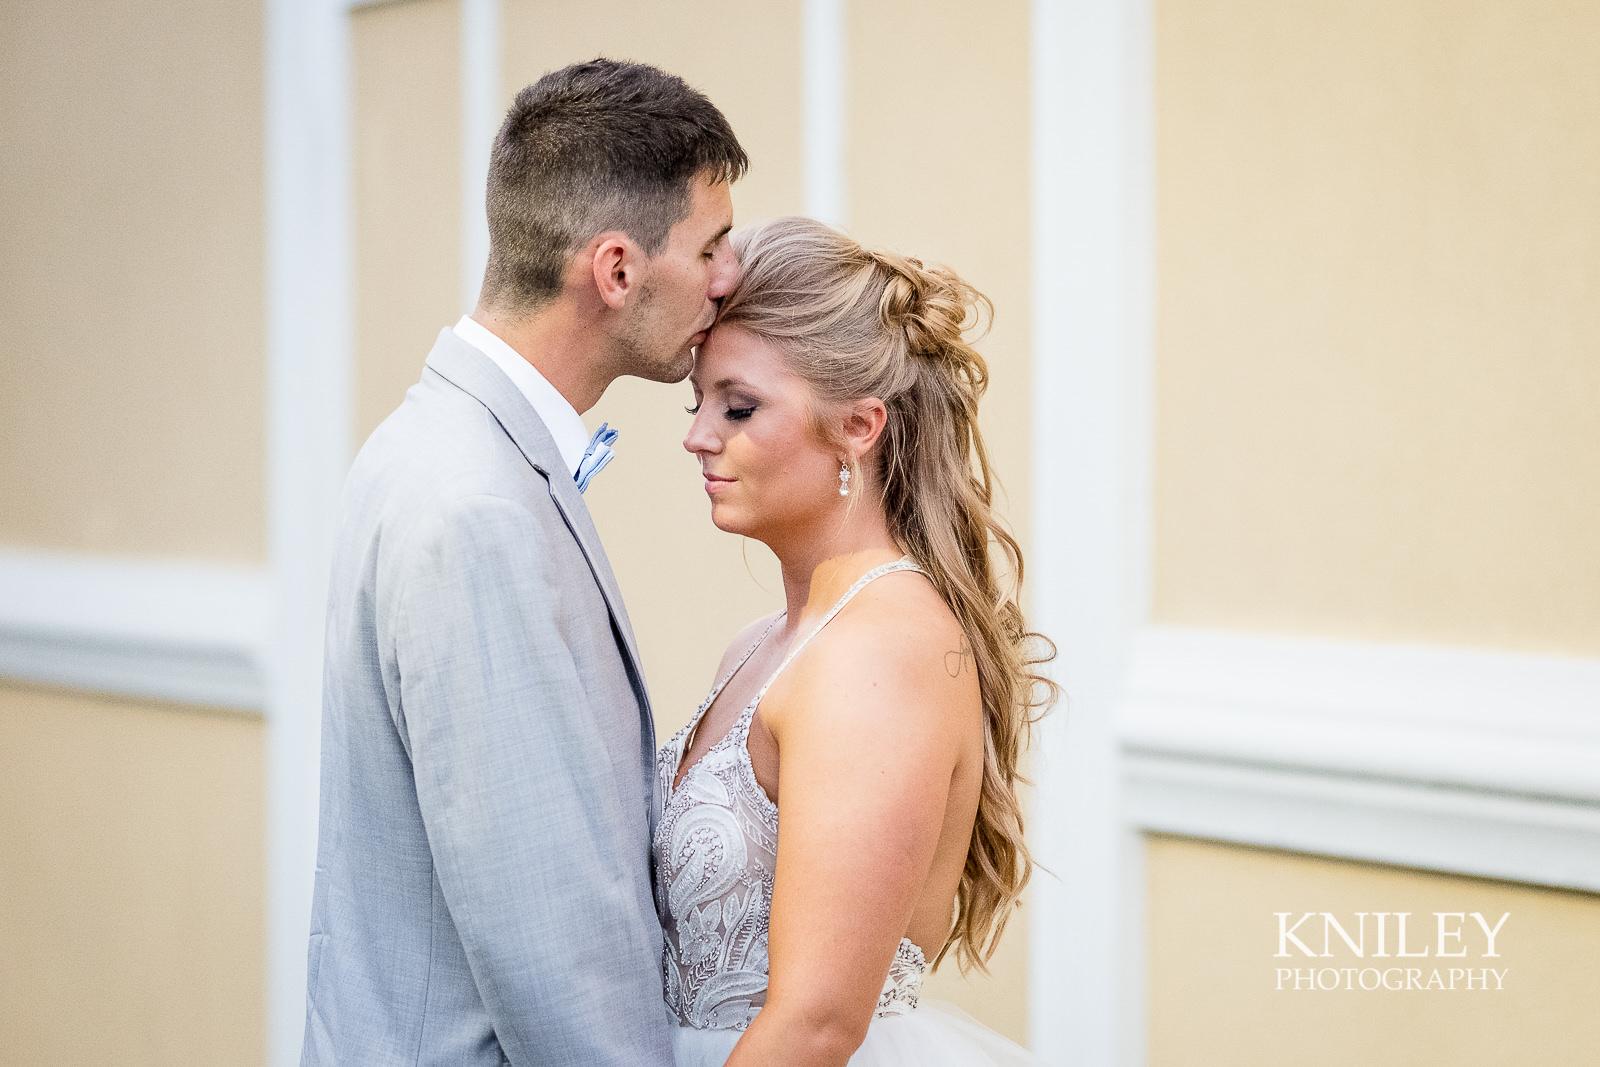 100 - Buffalo NY wedding pictures - Sean Patrick Restaurant Wedding Reception - Getzville - XT2A7391.jpg